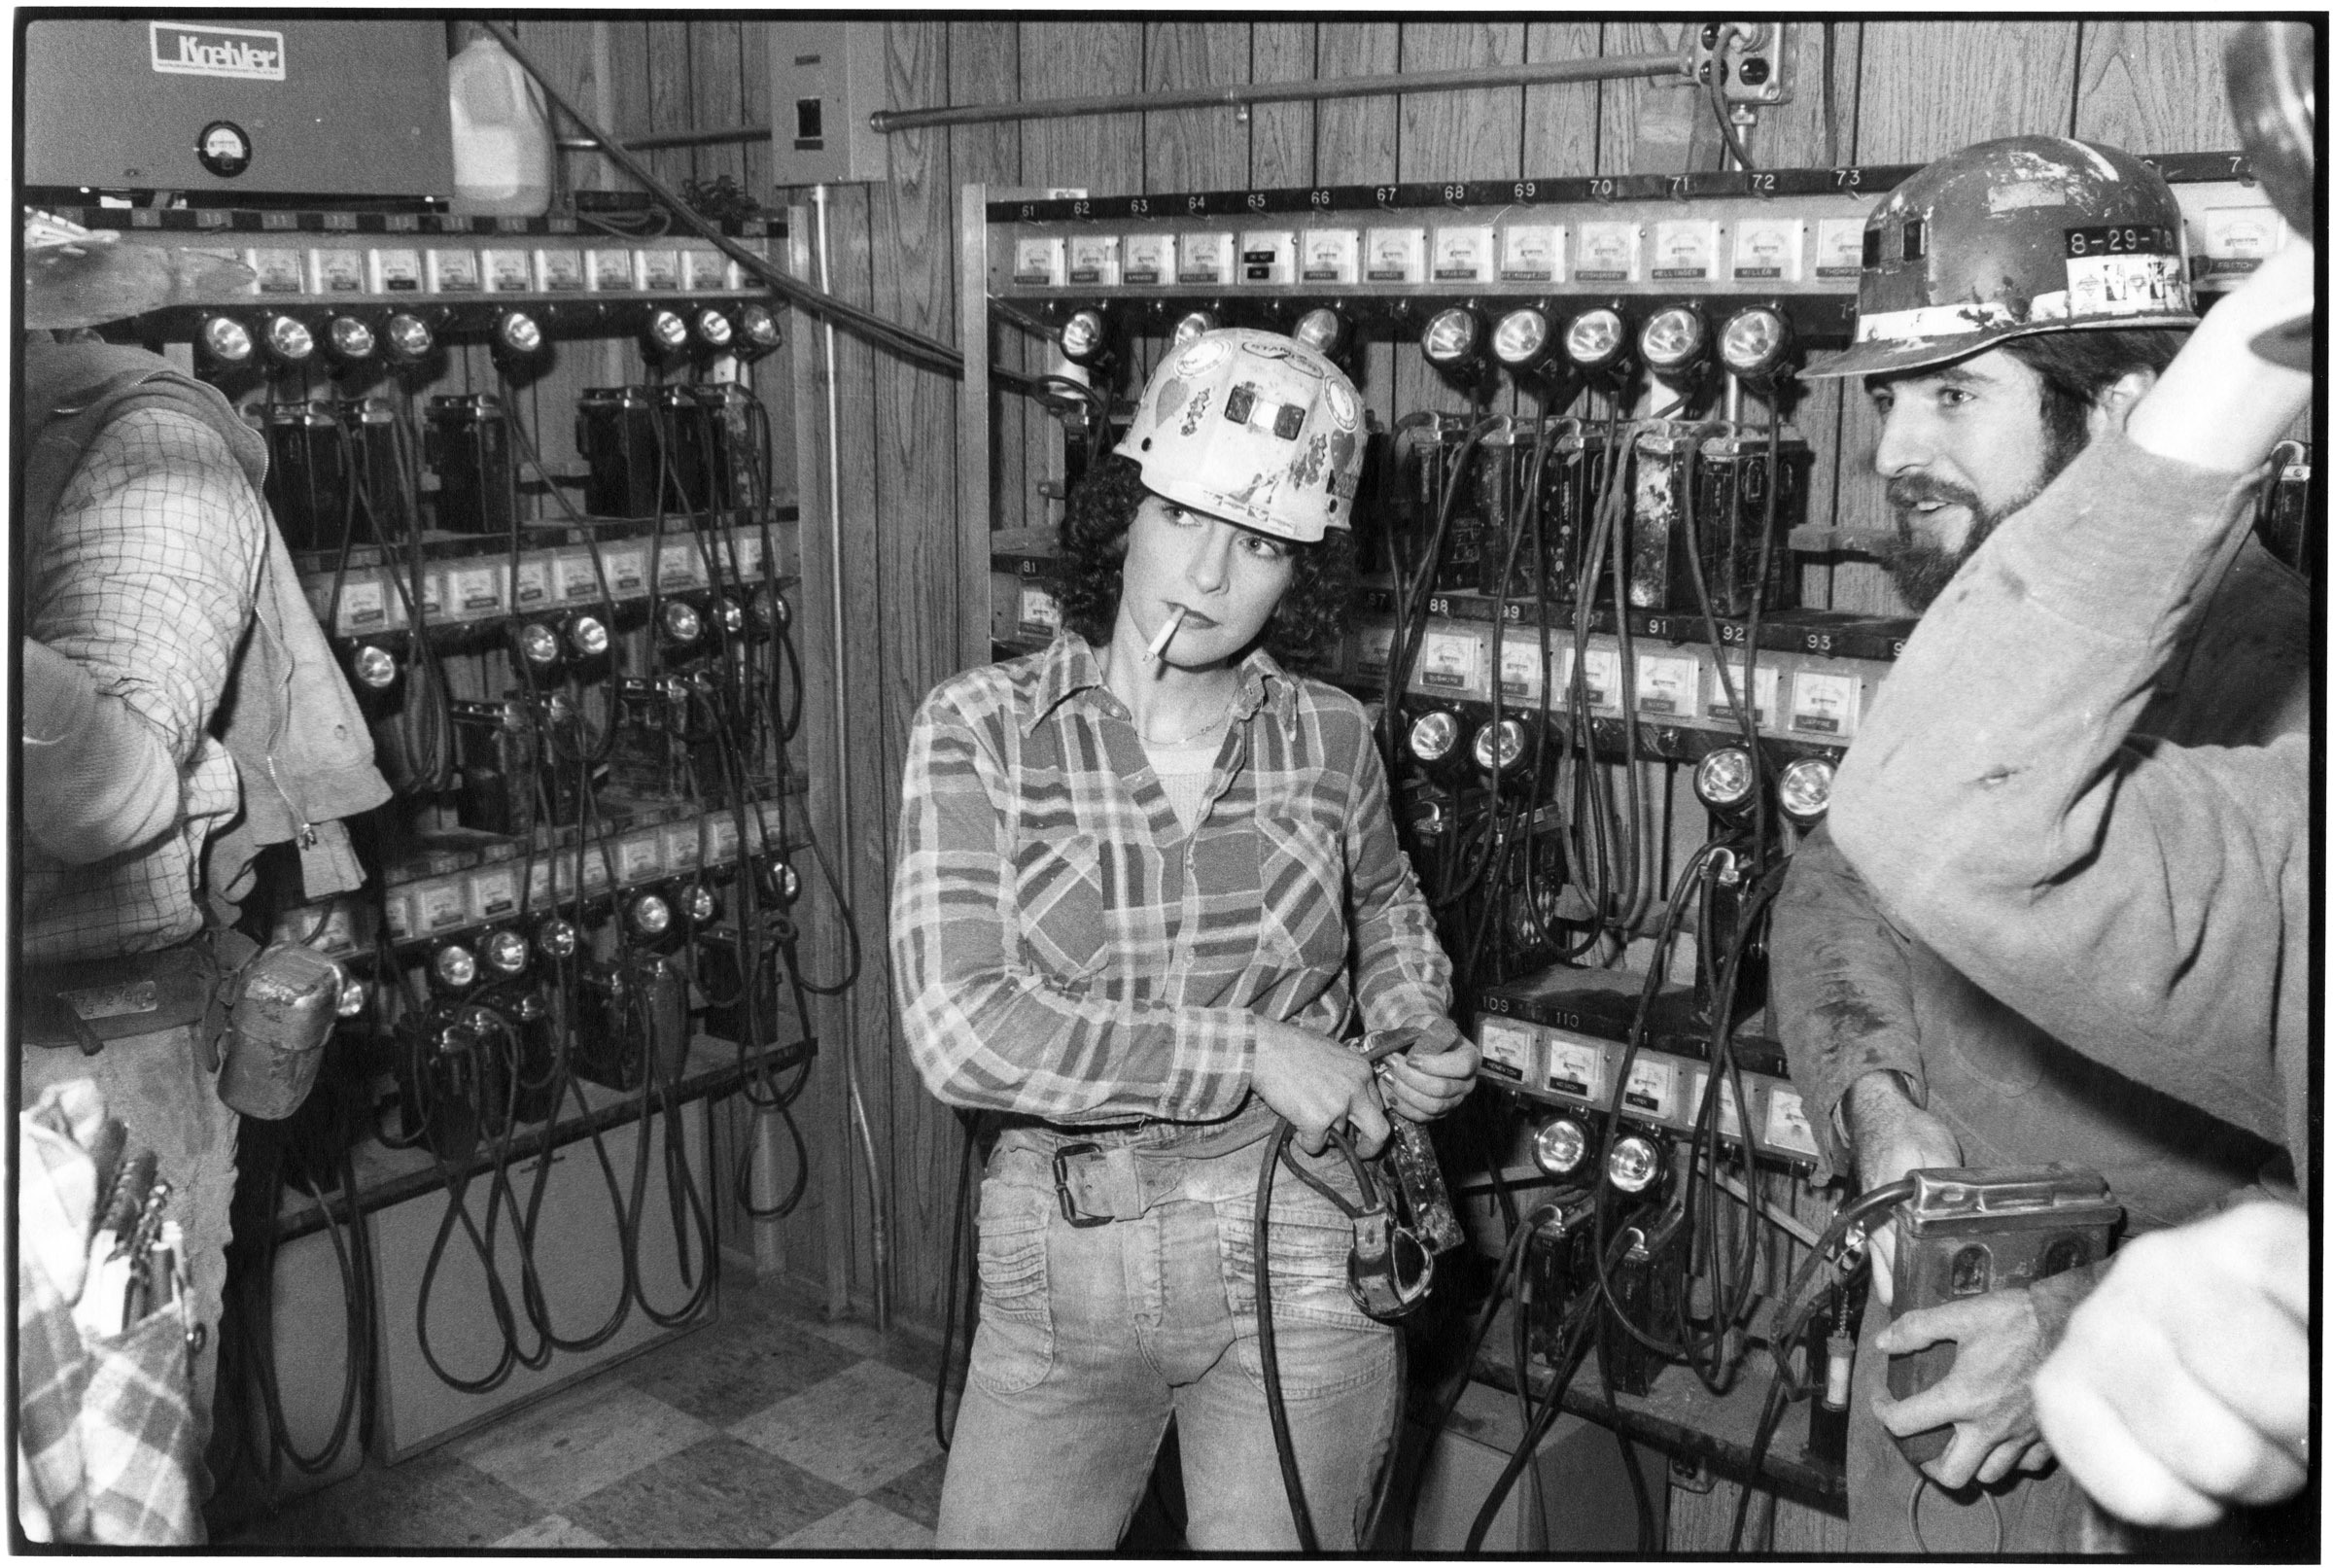 Image of female coal miner. Credit: Ted Wathen